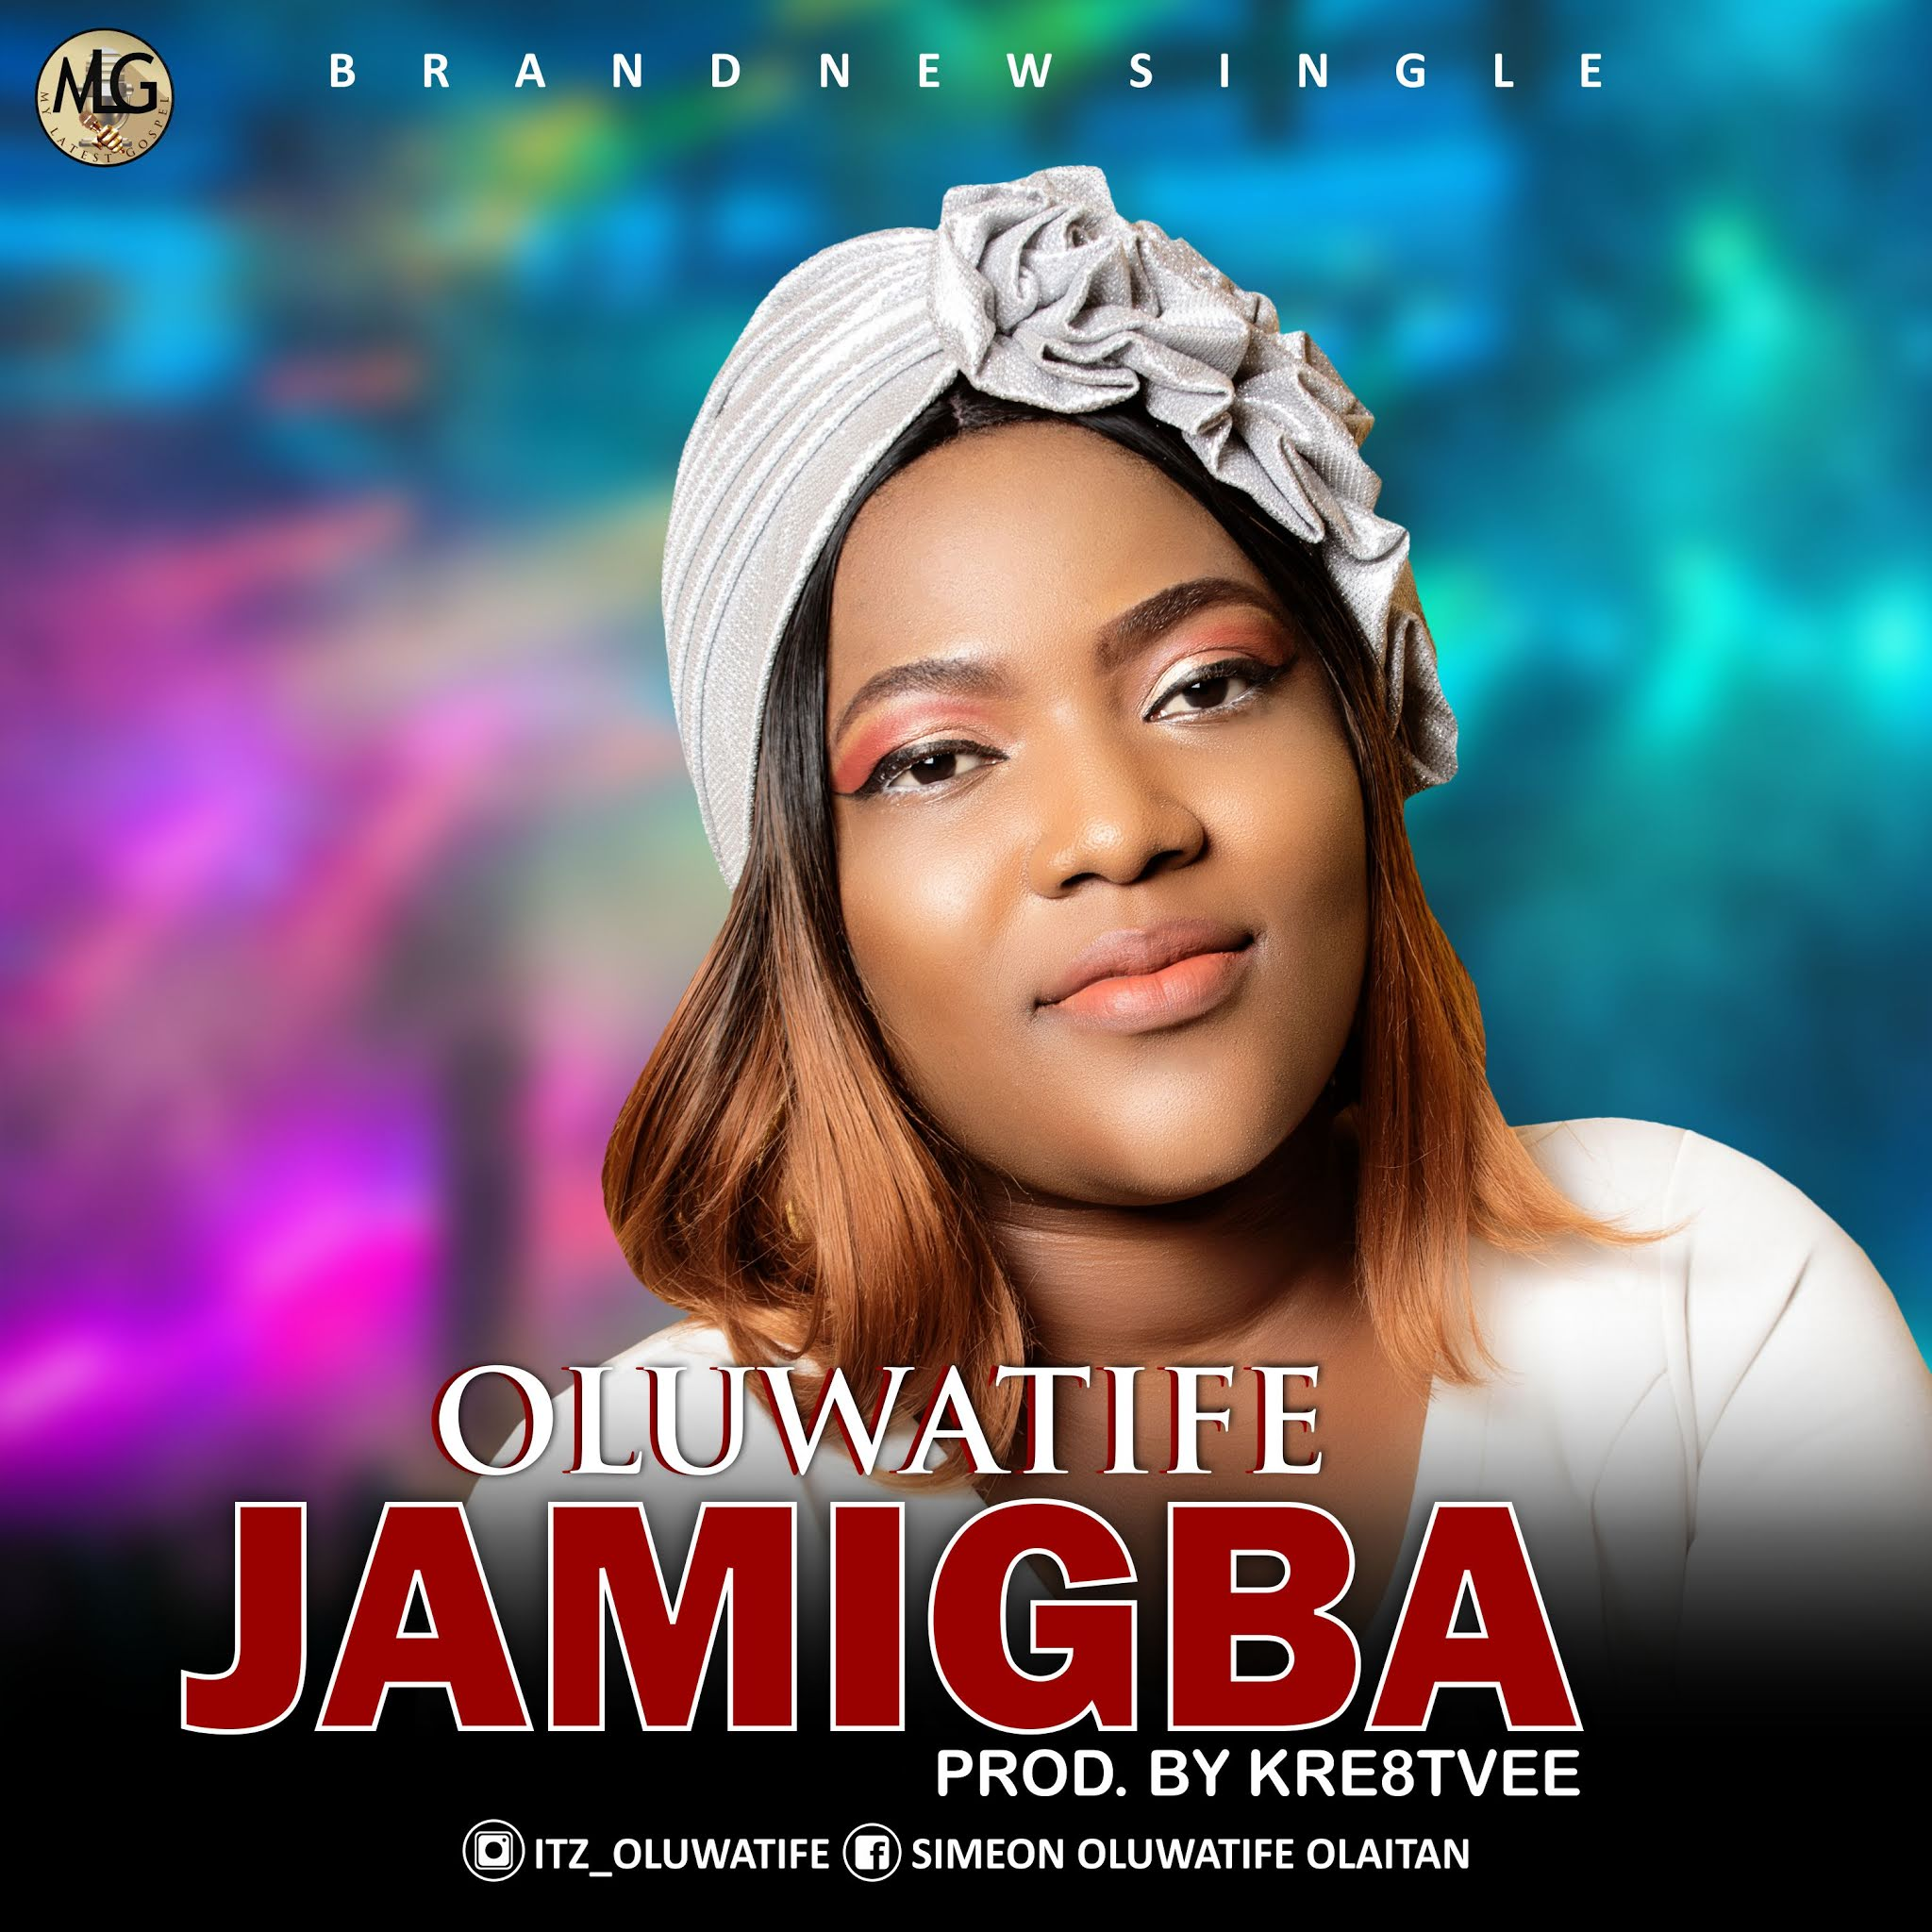 Photo of Jamigba by Oluwatife